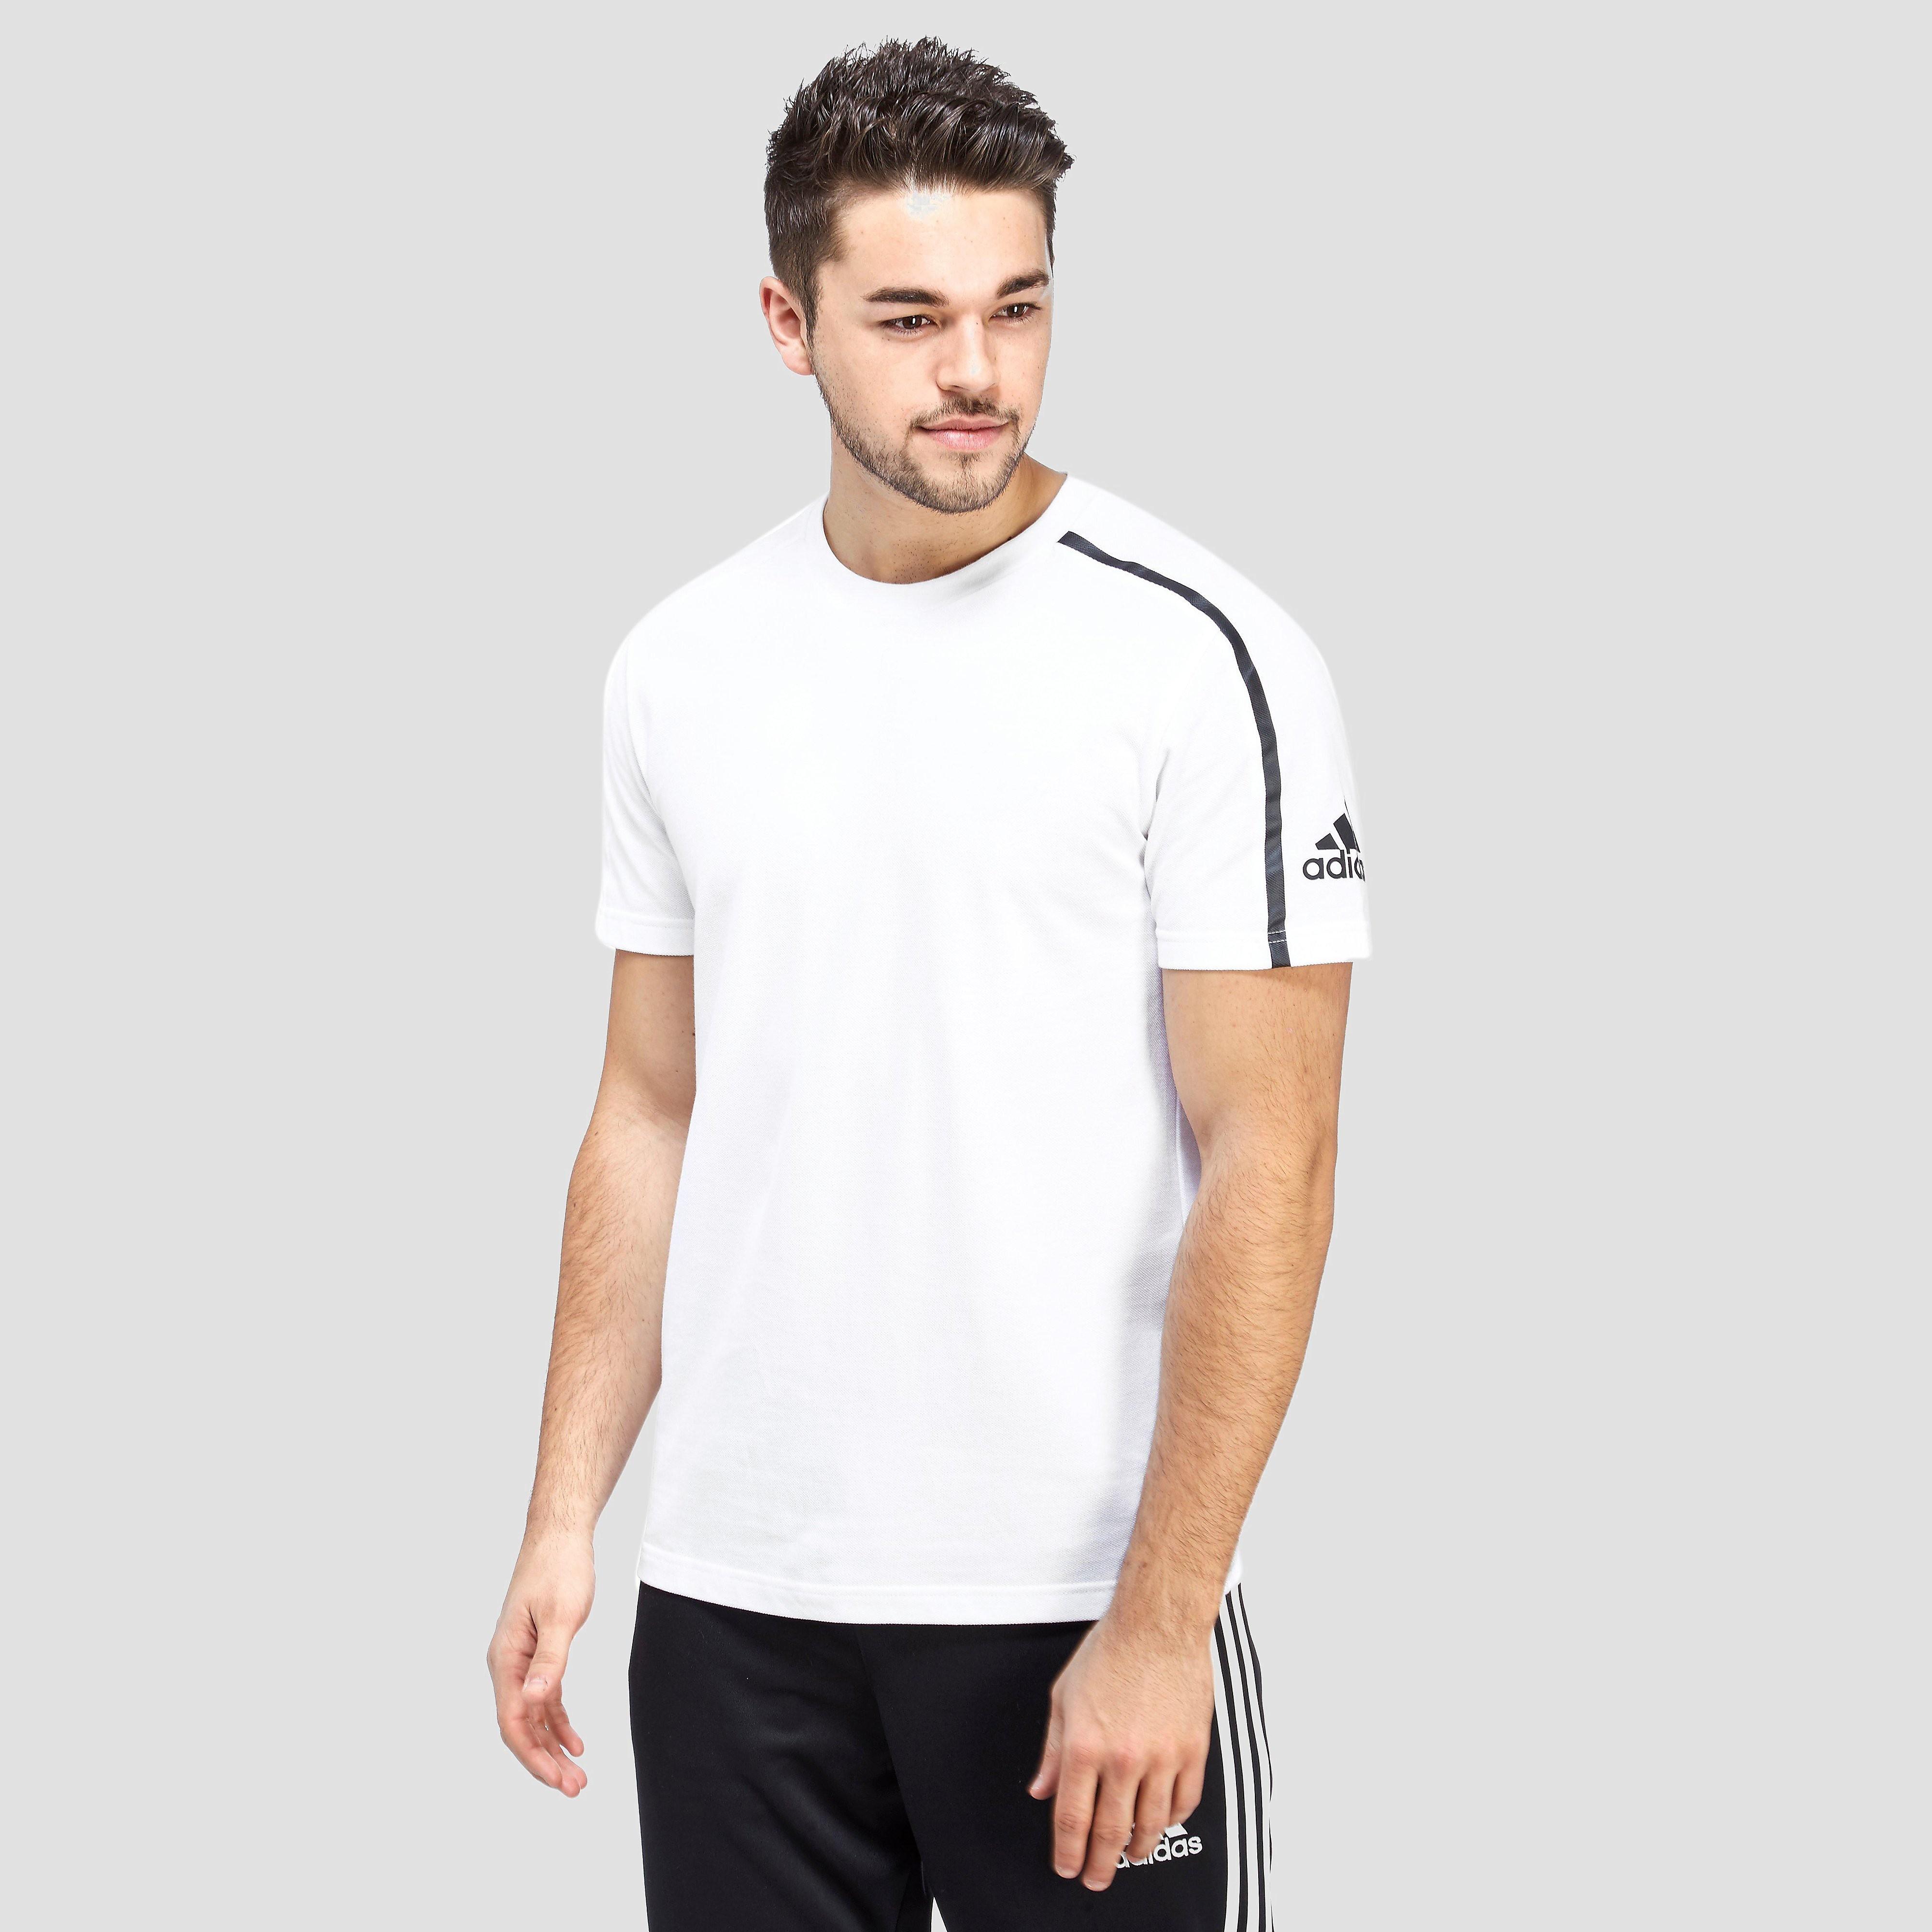 adidas Z.N.E Men's T-Shirt